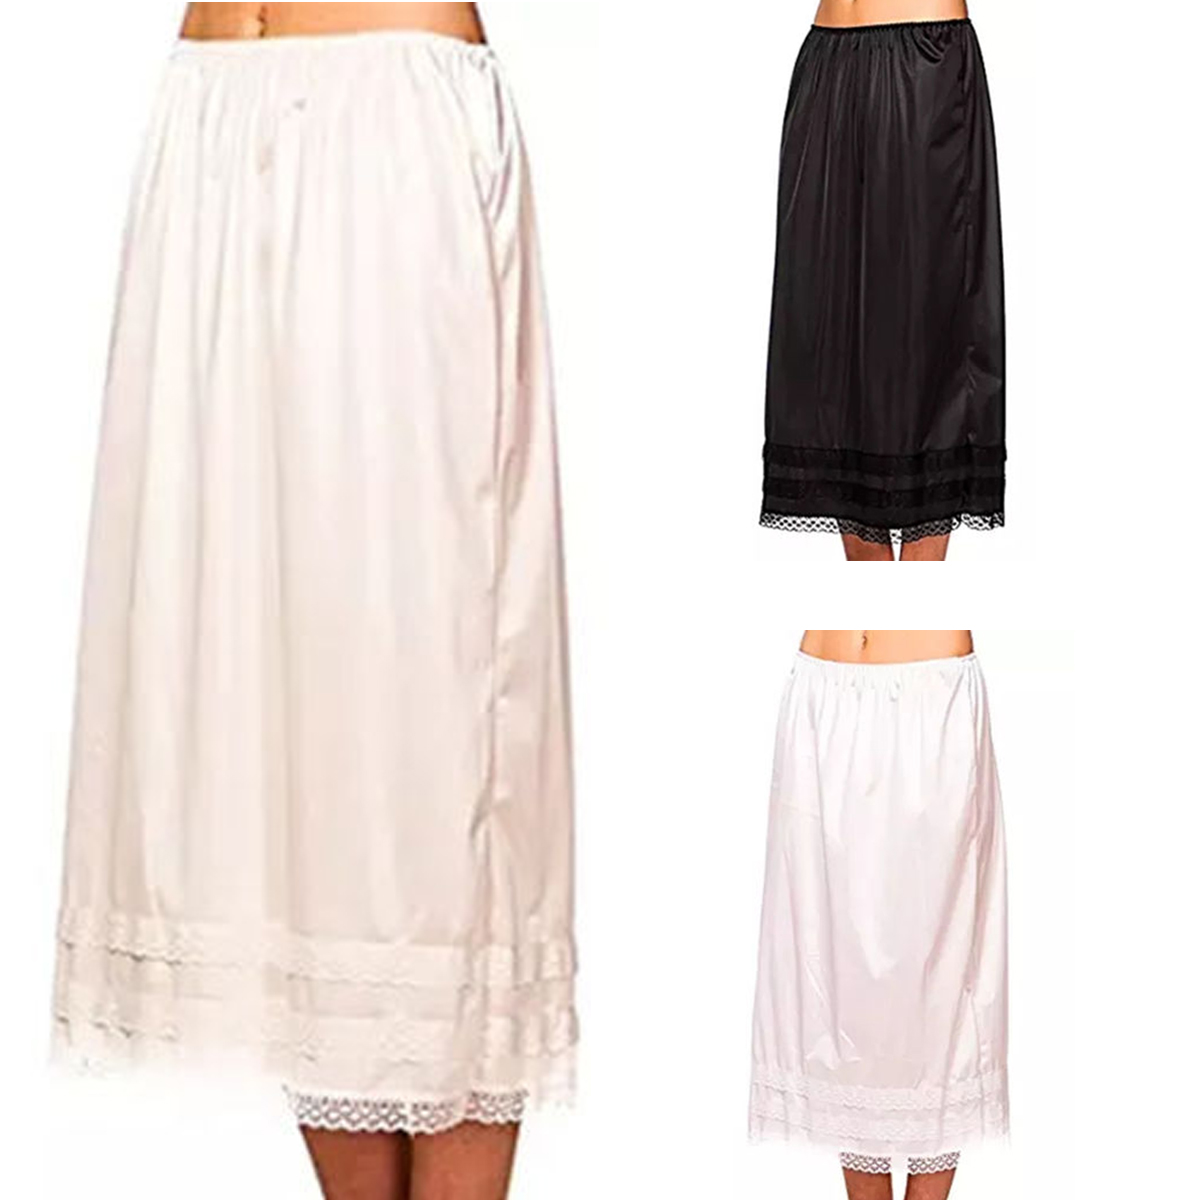 Skirt Nightgown